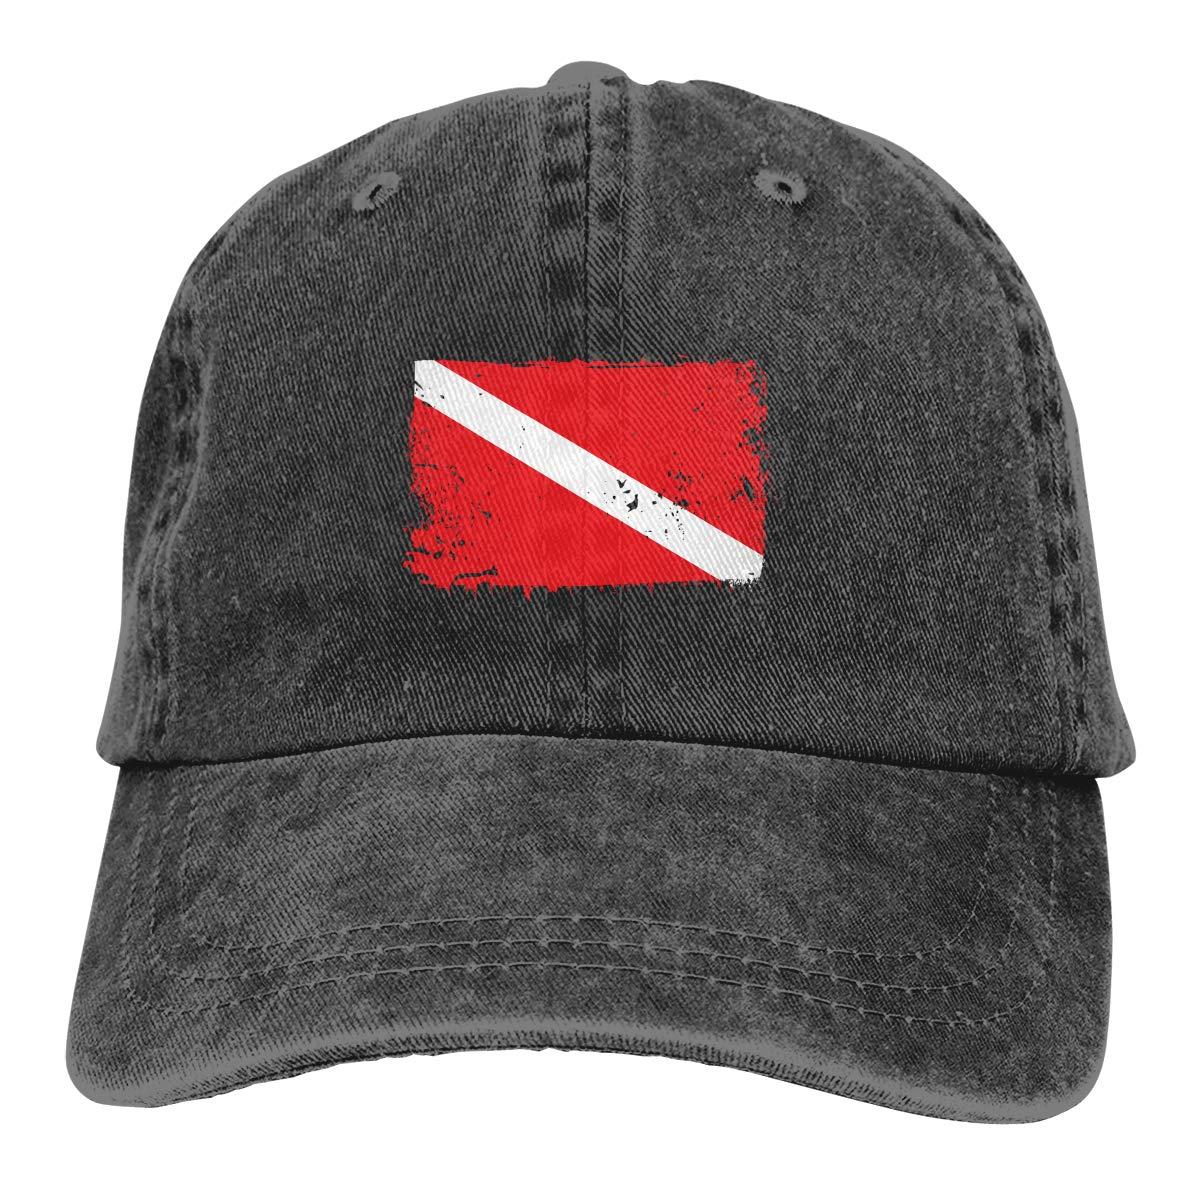 Scuba Diving Dive Flag Unisex Baseball Cap Adjustable Dad Hat Plain Cap